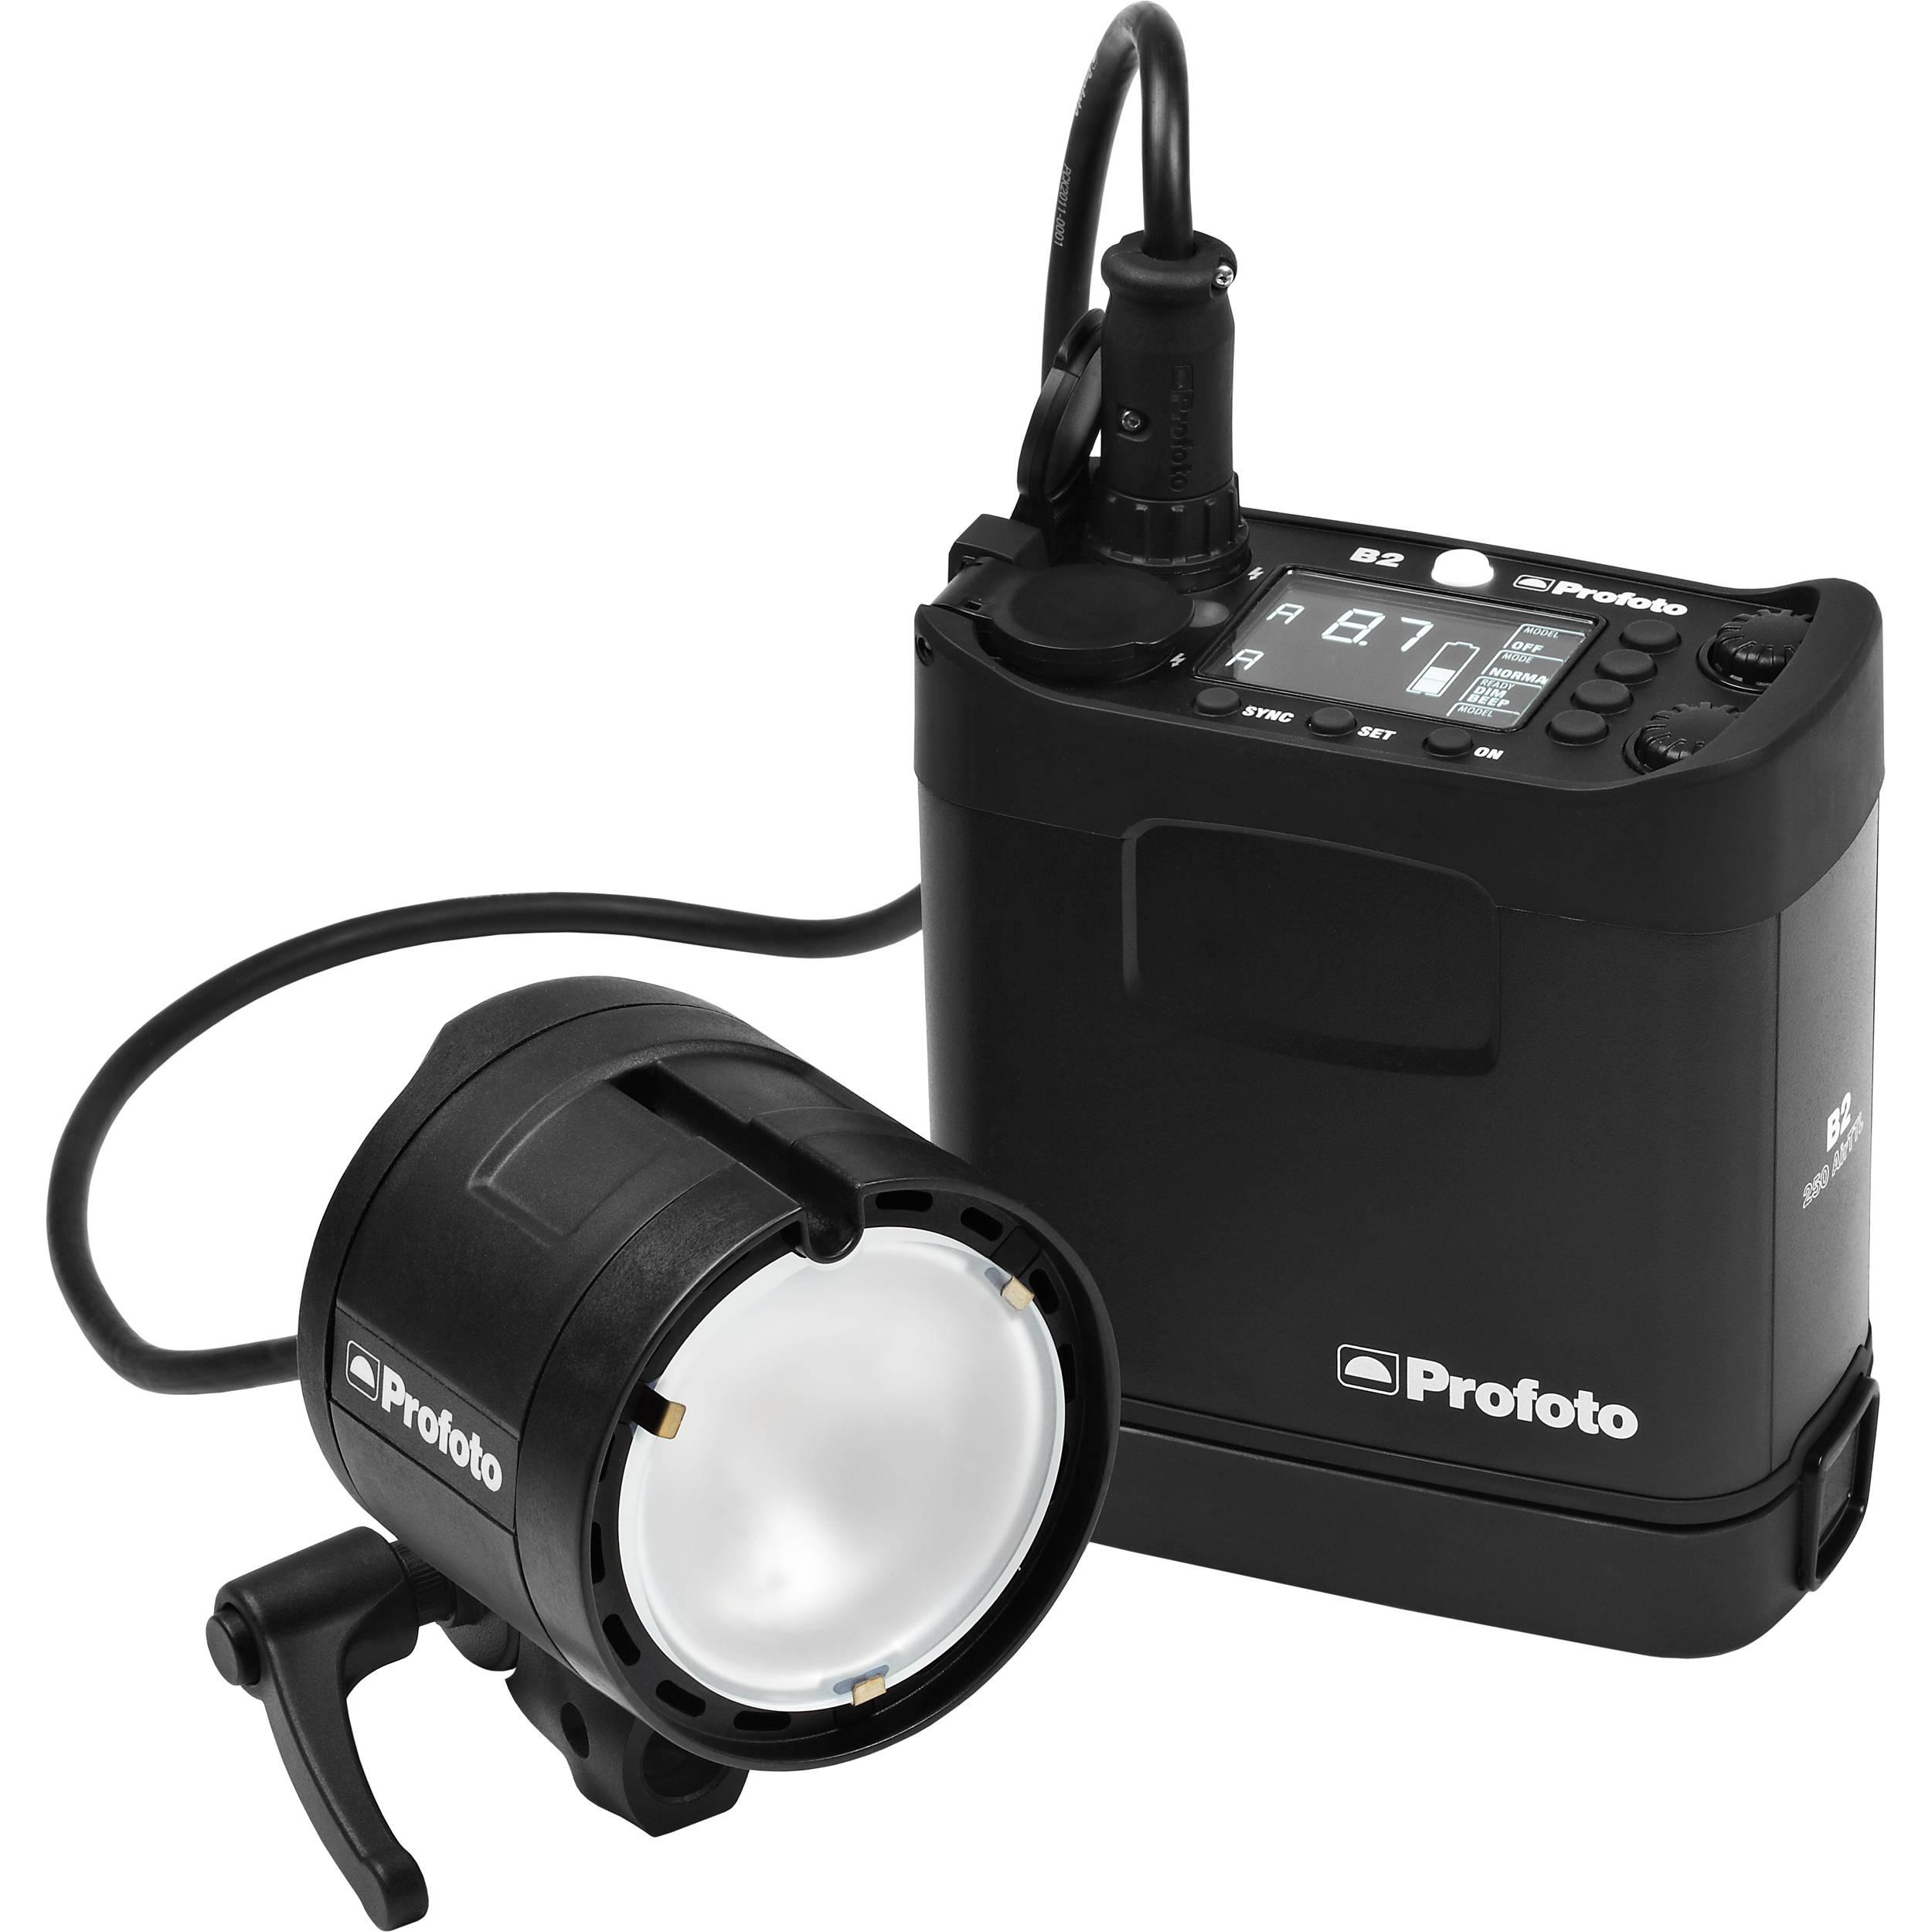 Profoto Studio Lighting Kit: Profoto B2 250 Air TTL To-Go Kit 901109 B&H Photo Video